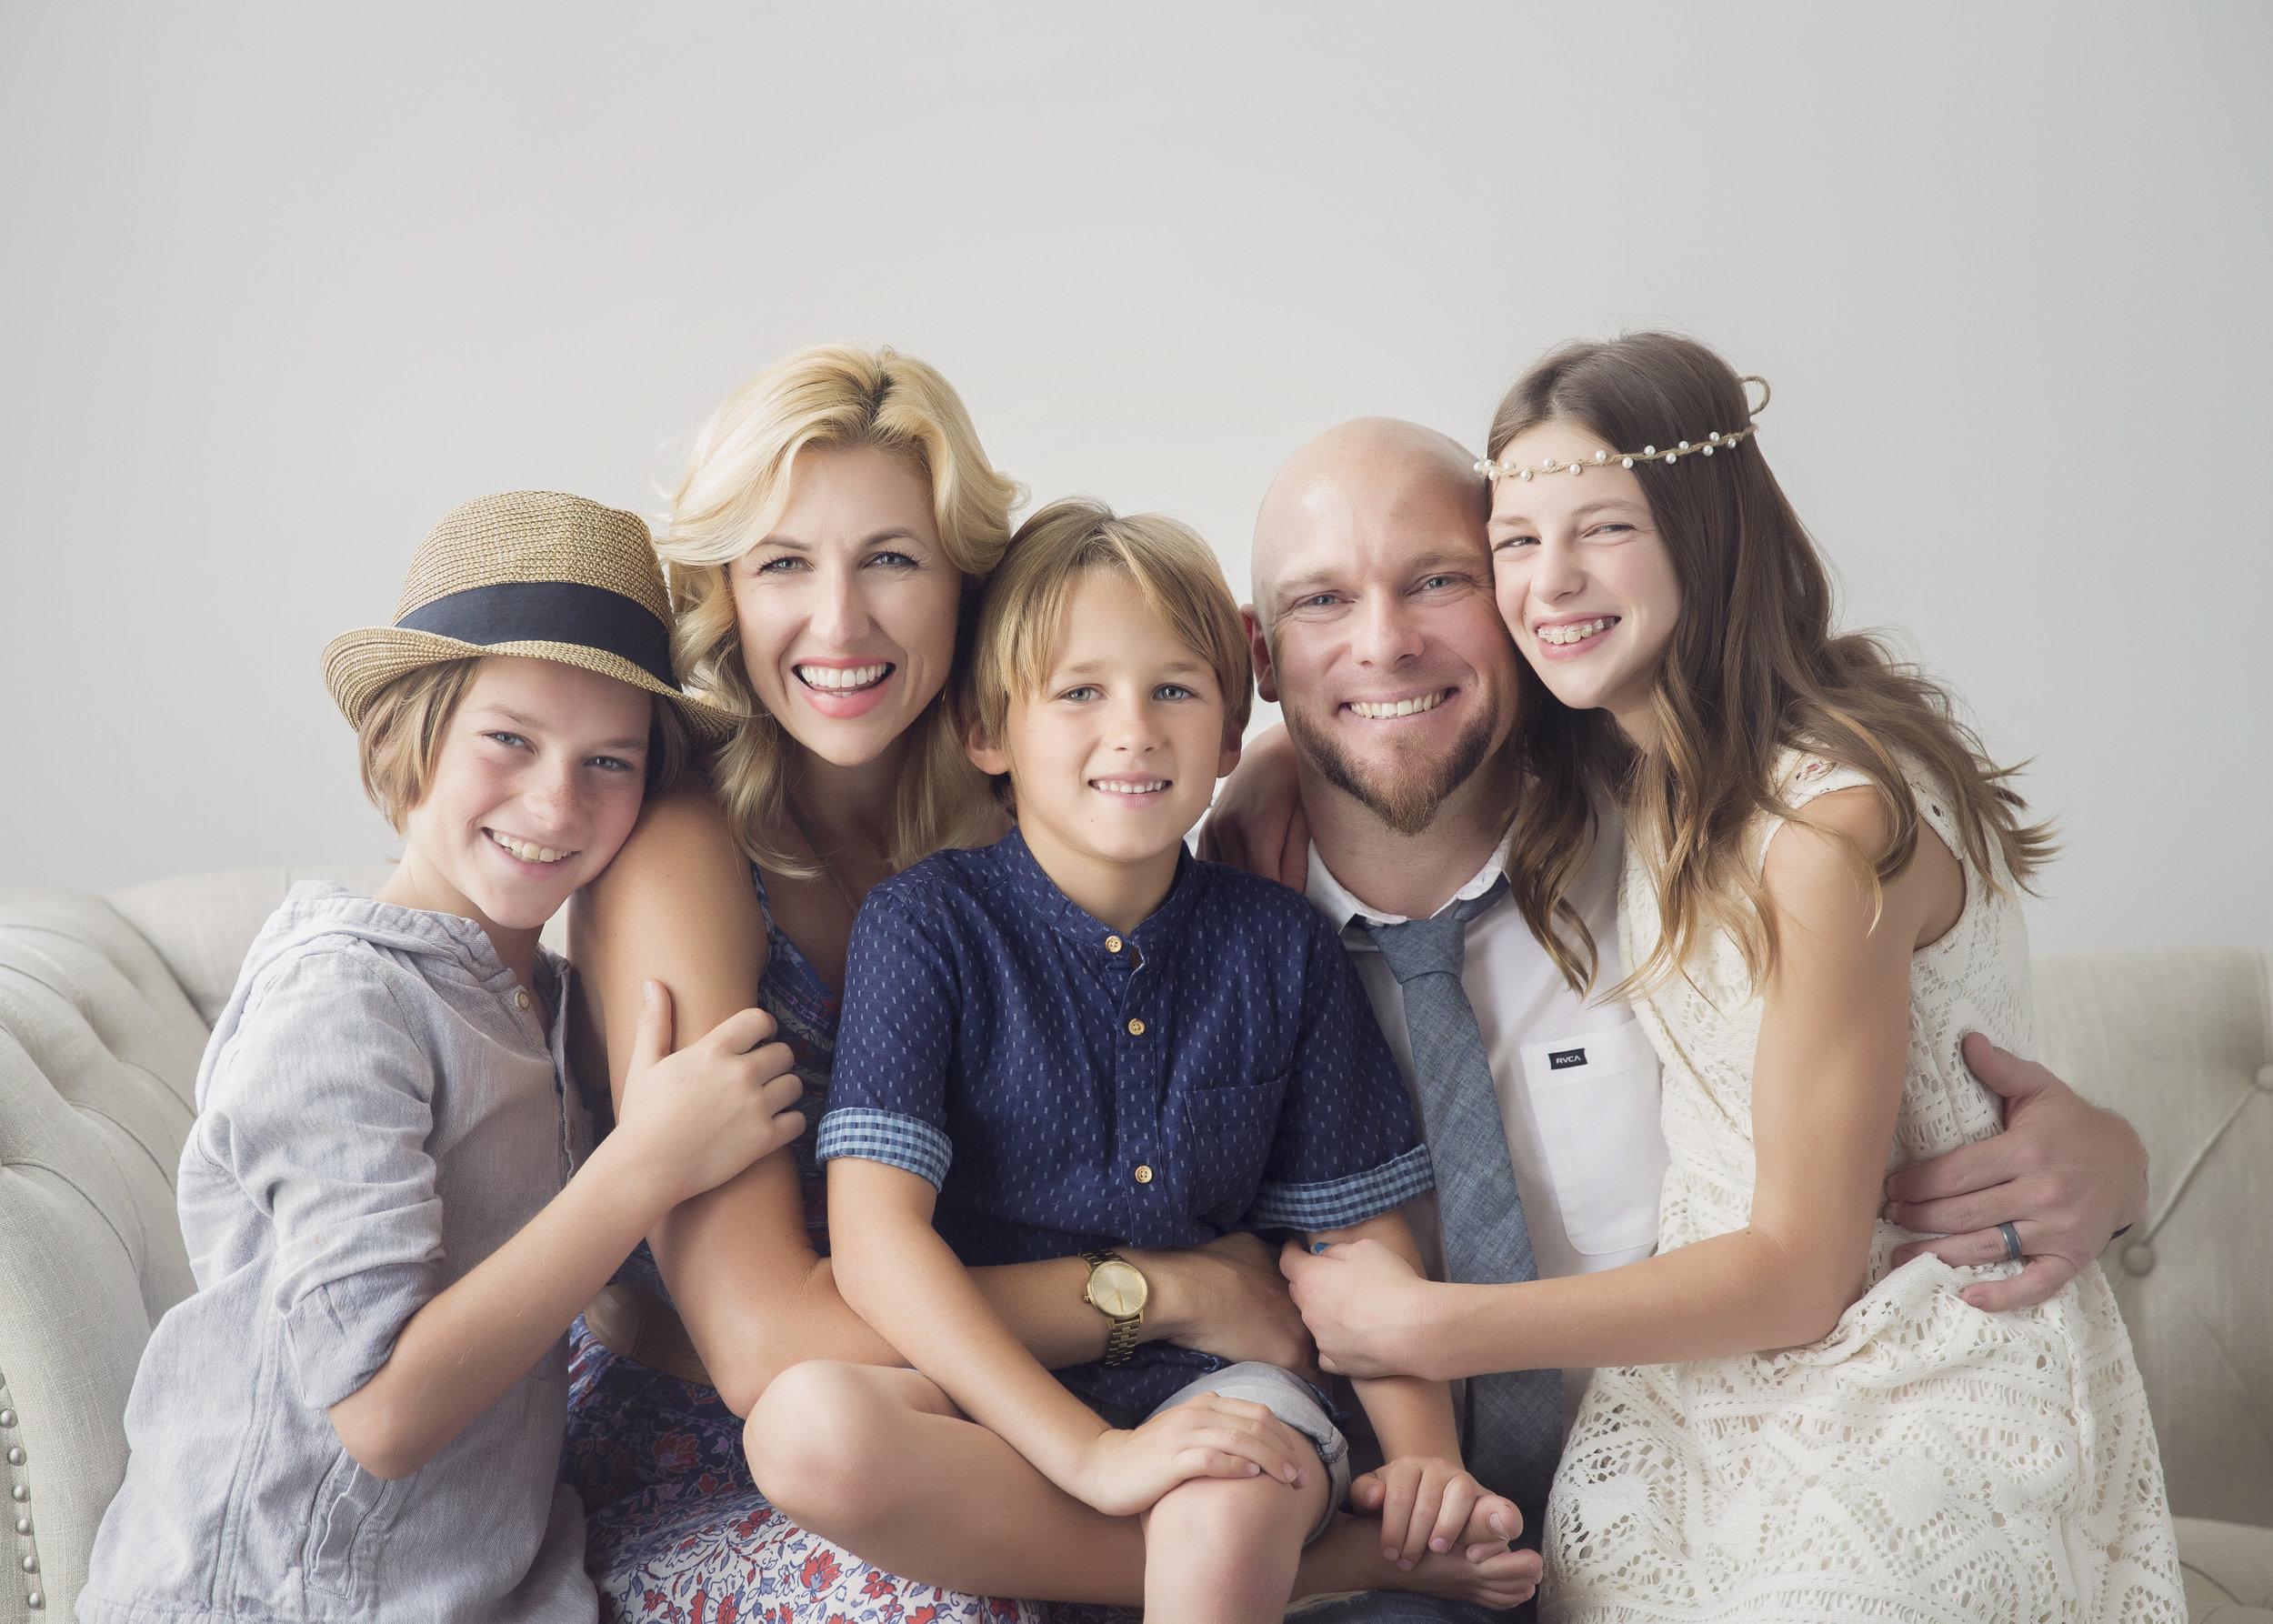 One Flesh The Hamilton Family.jpg